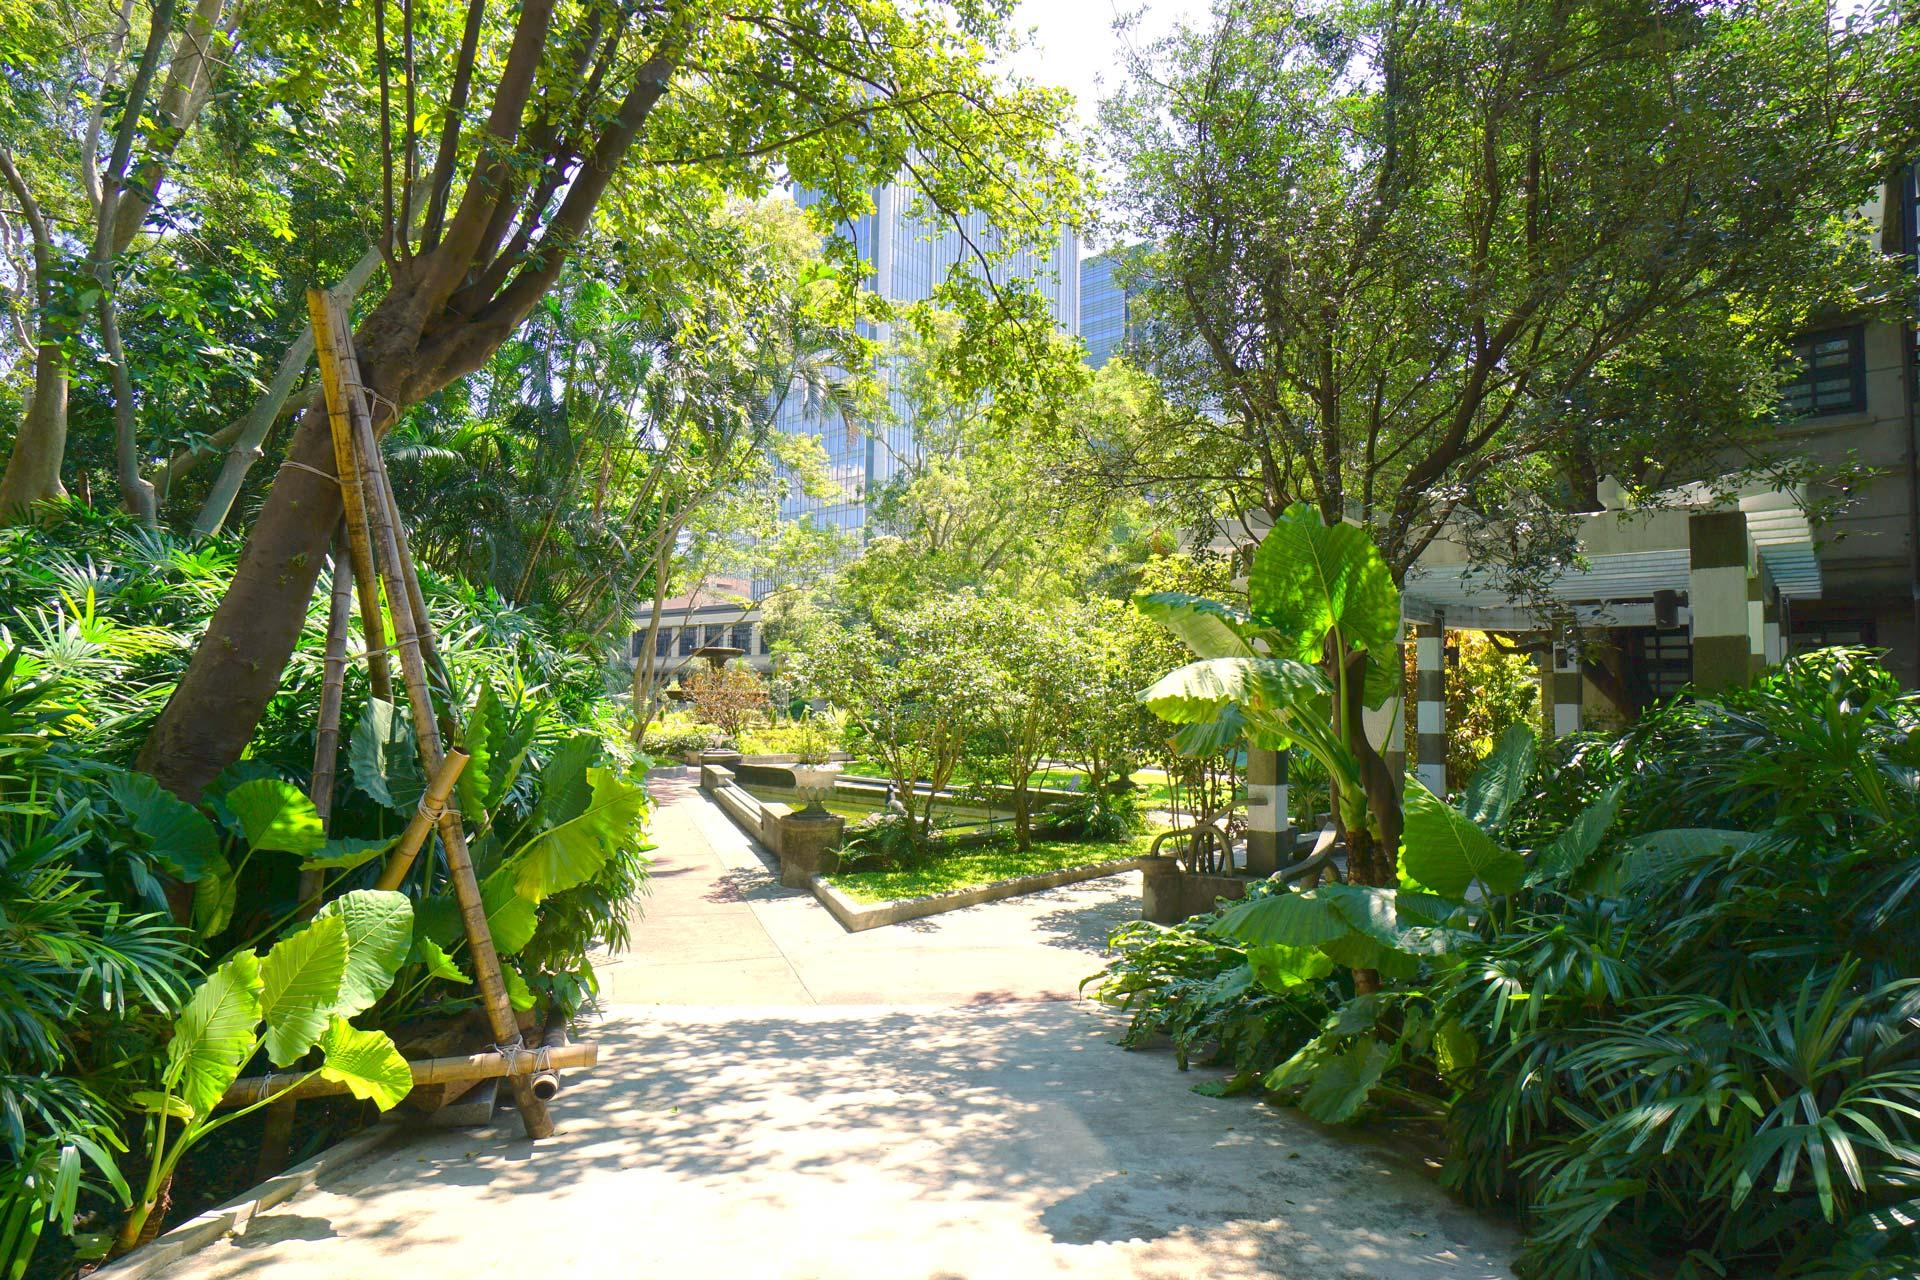 Blick in den Garten des Songshan Cultural and Creative Park